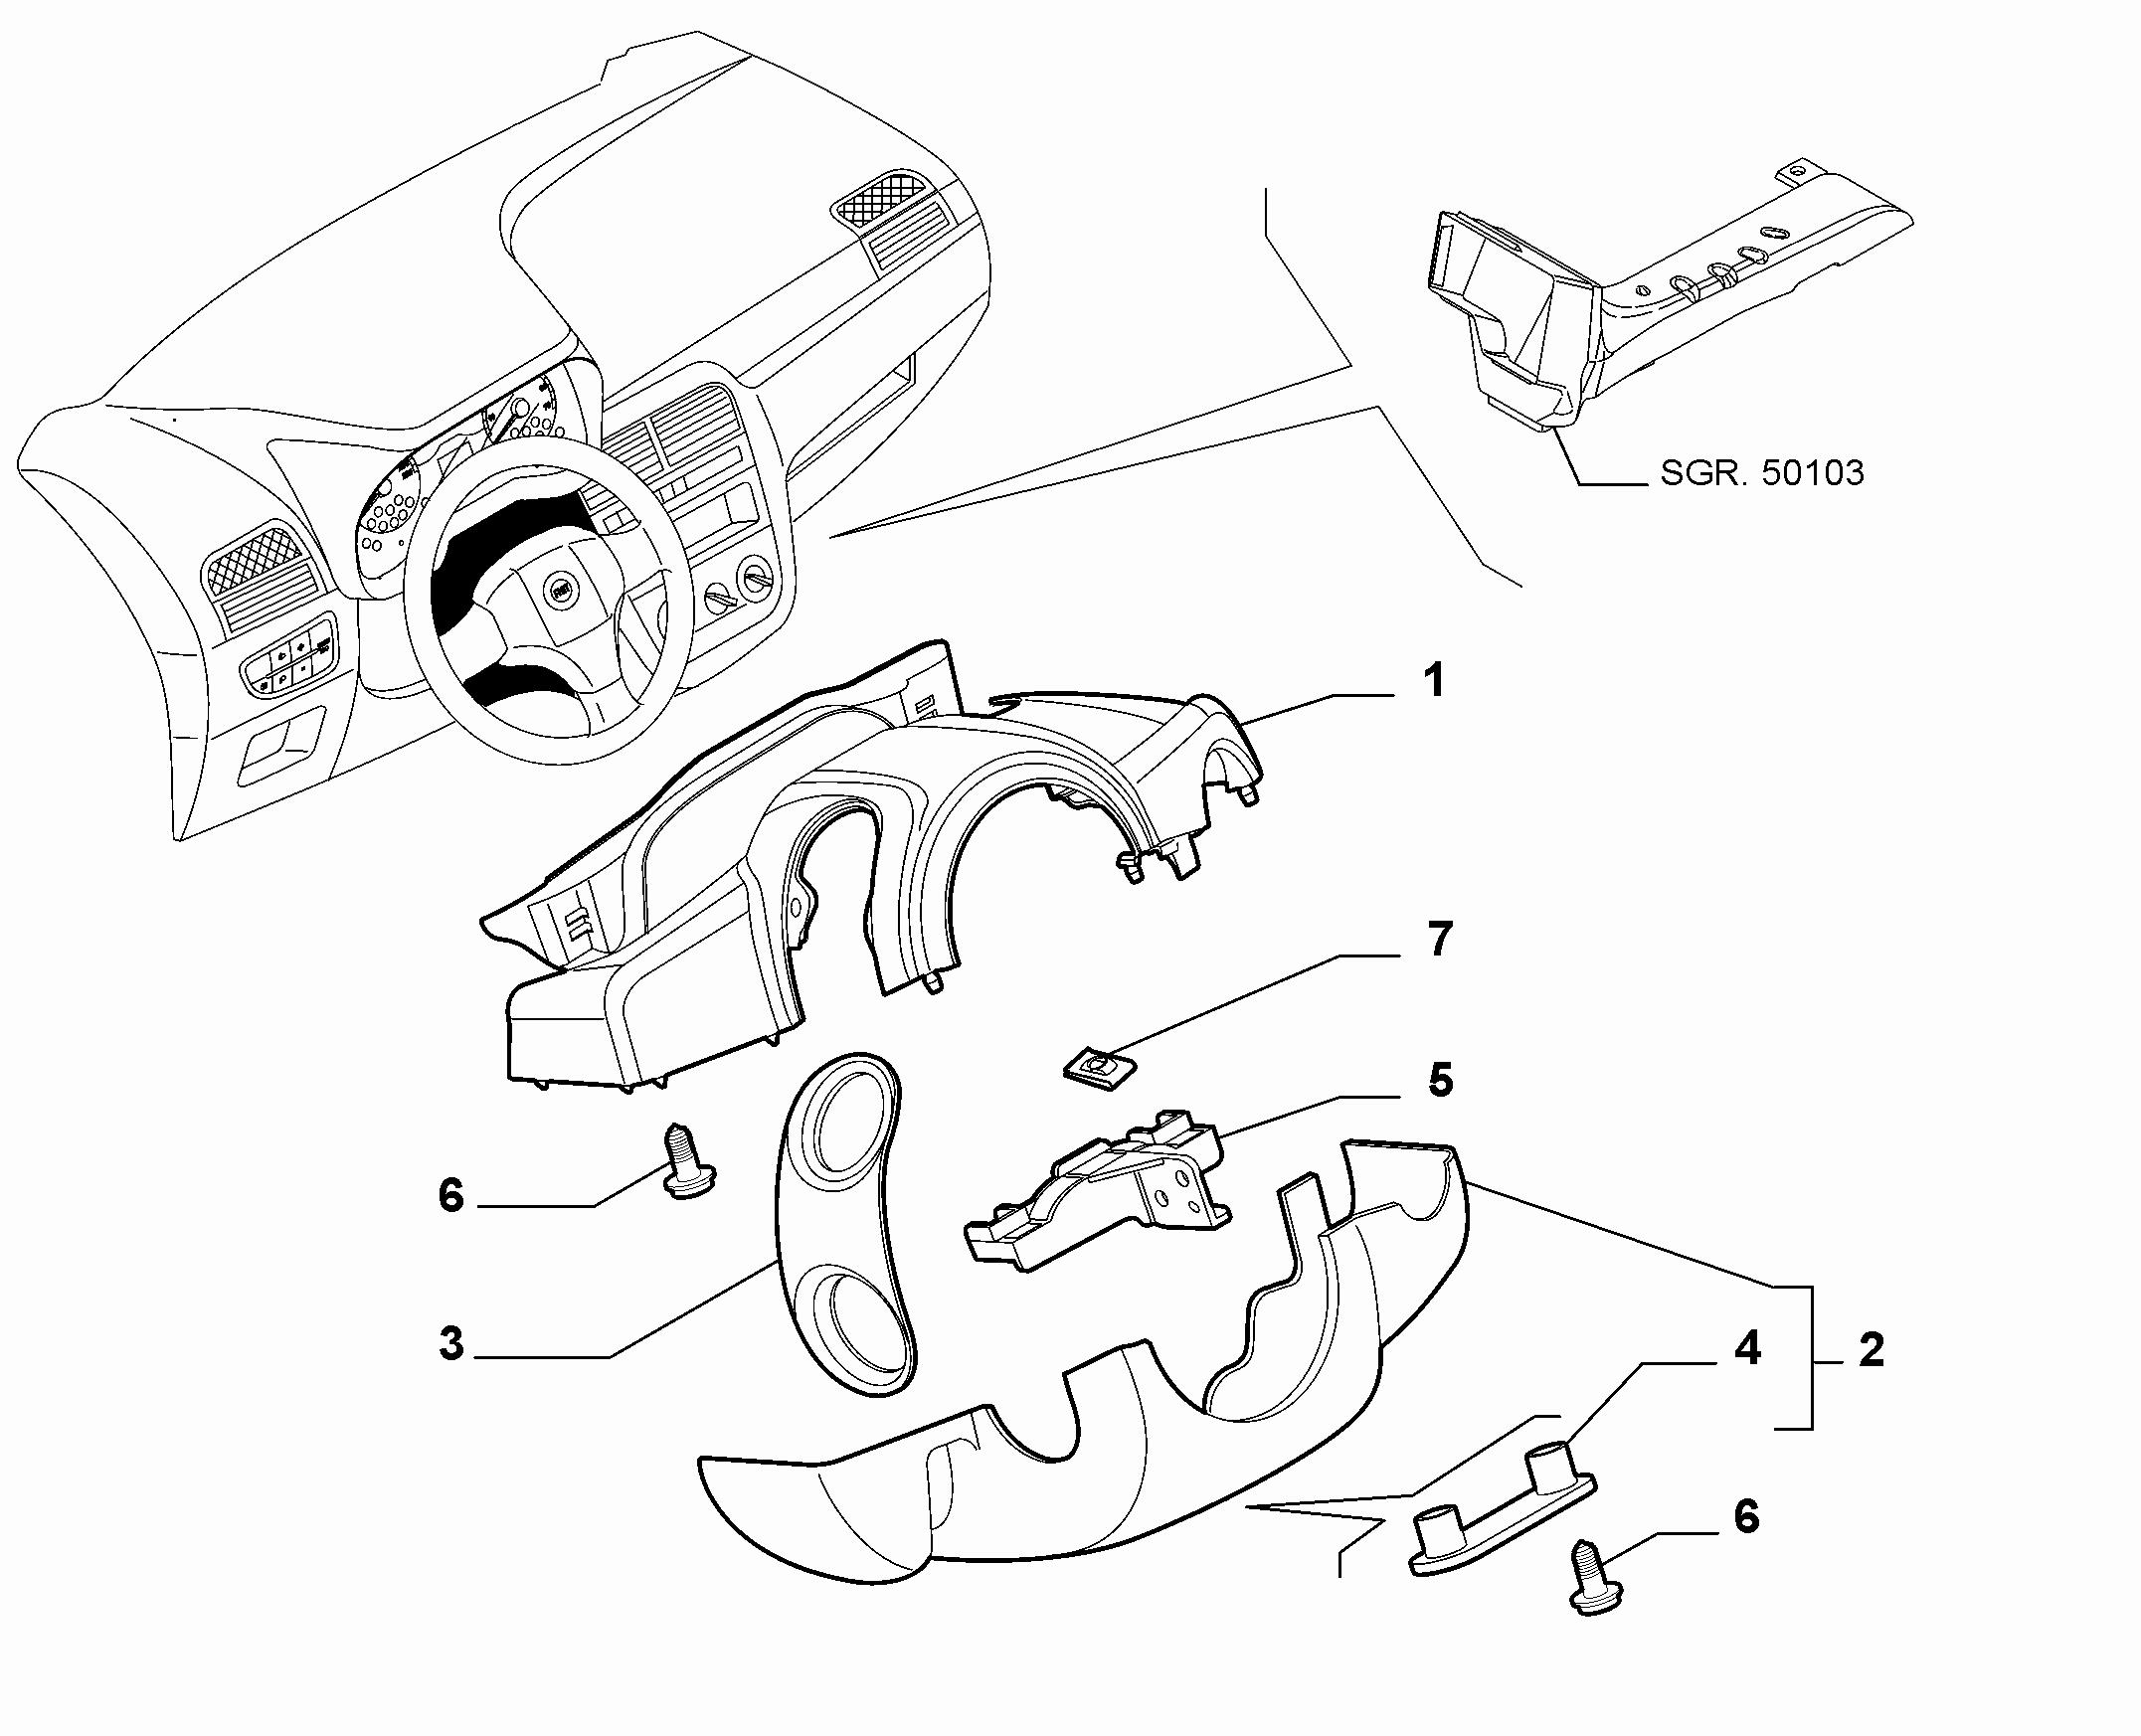 70502-060 STEERING COLUMN GUARDS